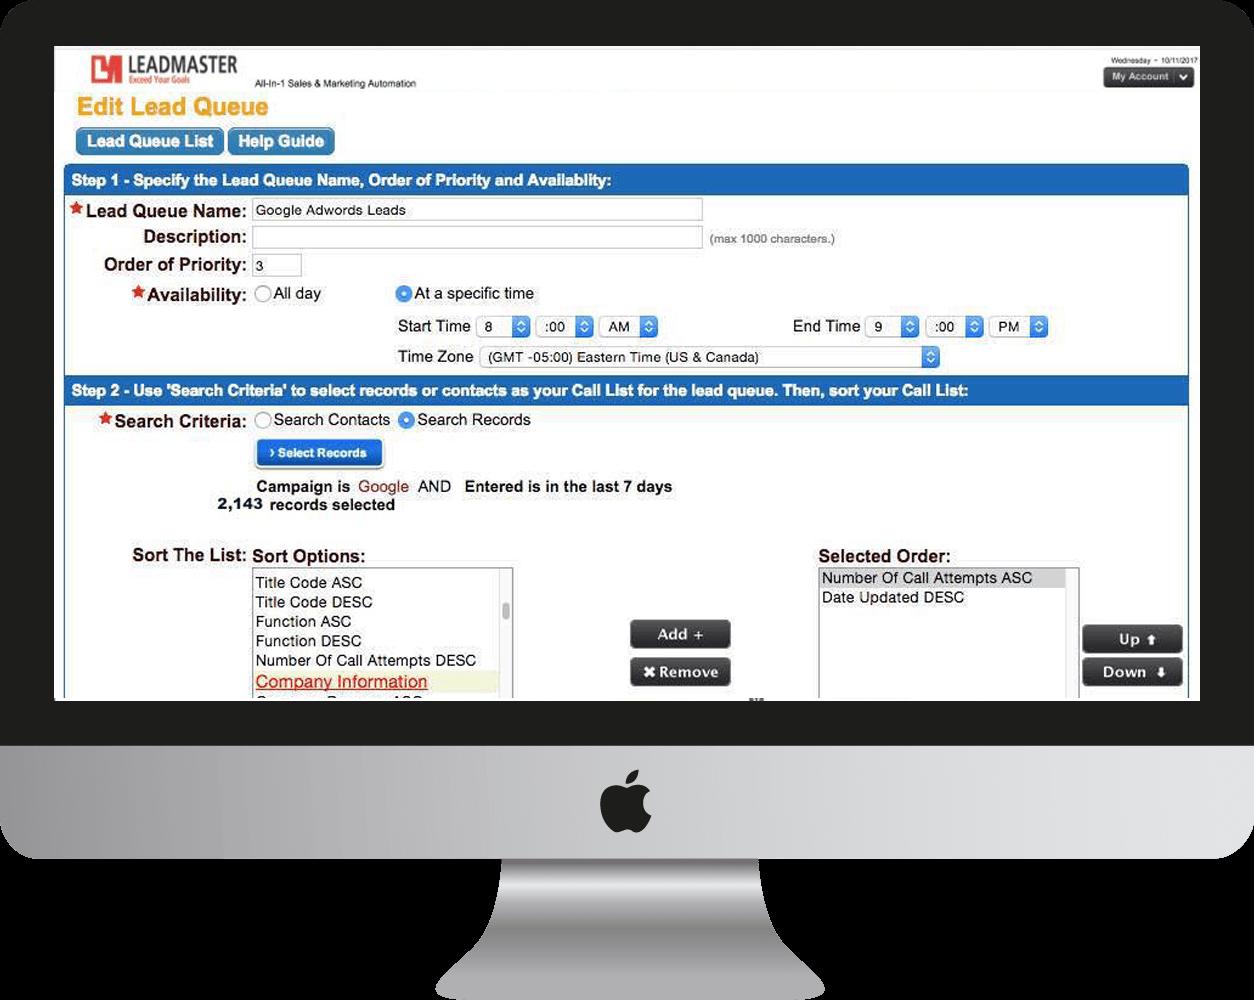 Desktop Mac computer displaying LeadMaster's edit lead queue on the screen